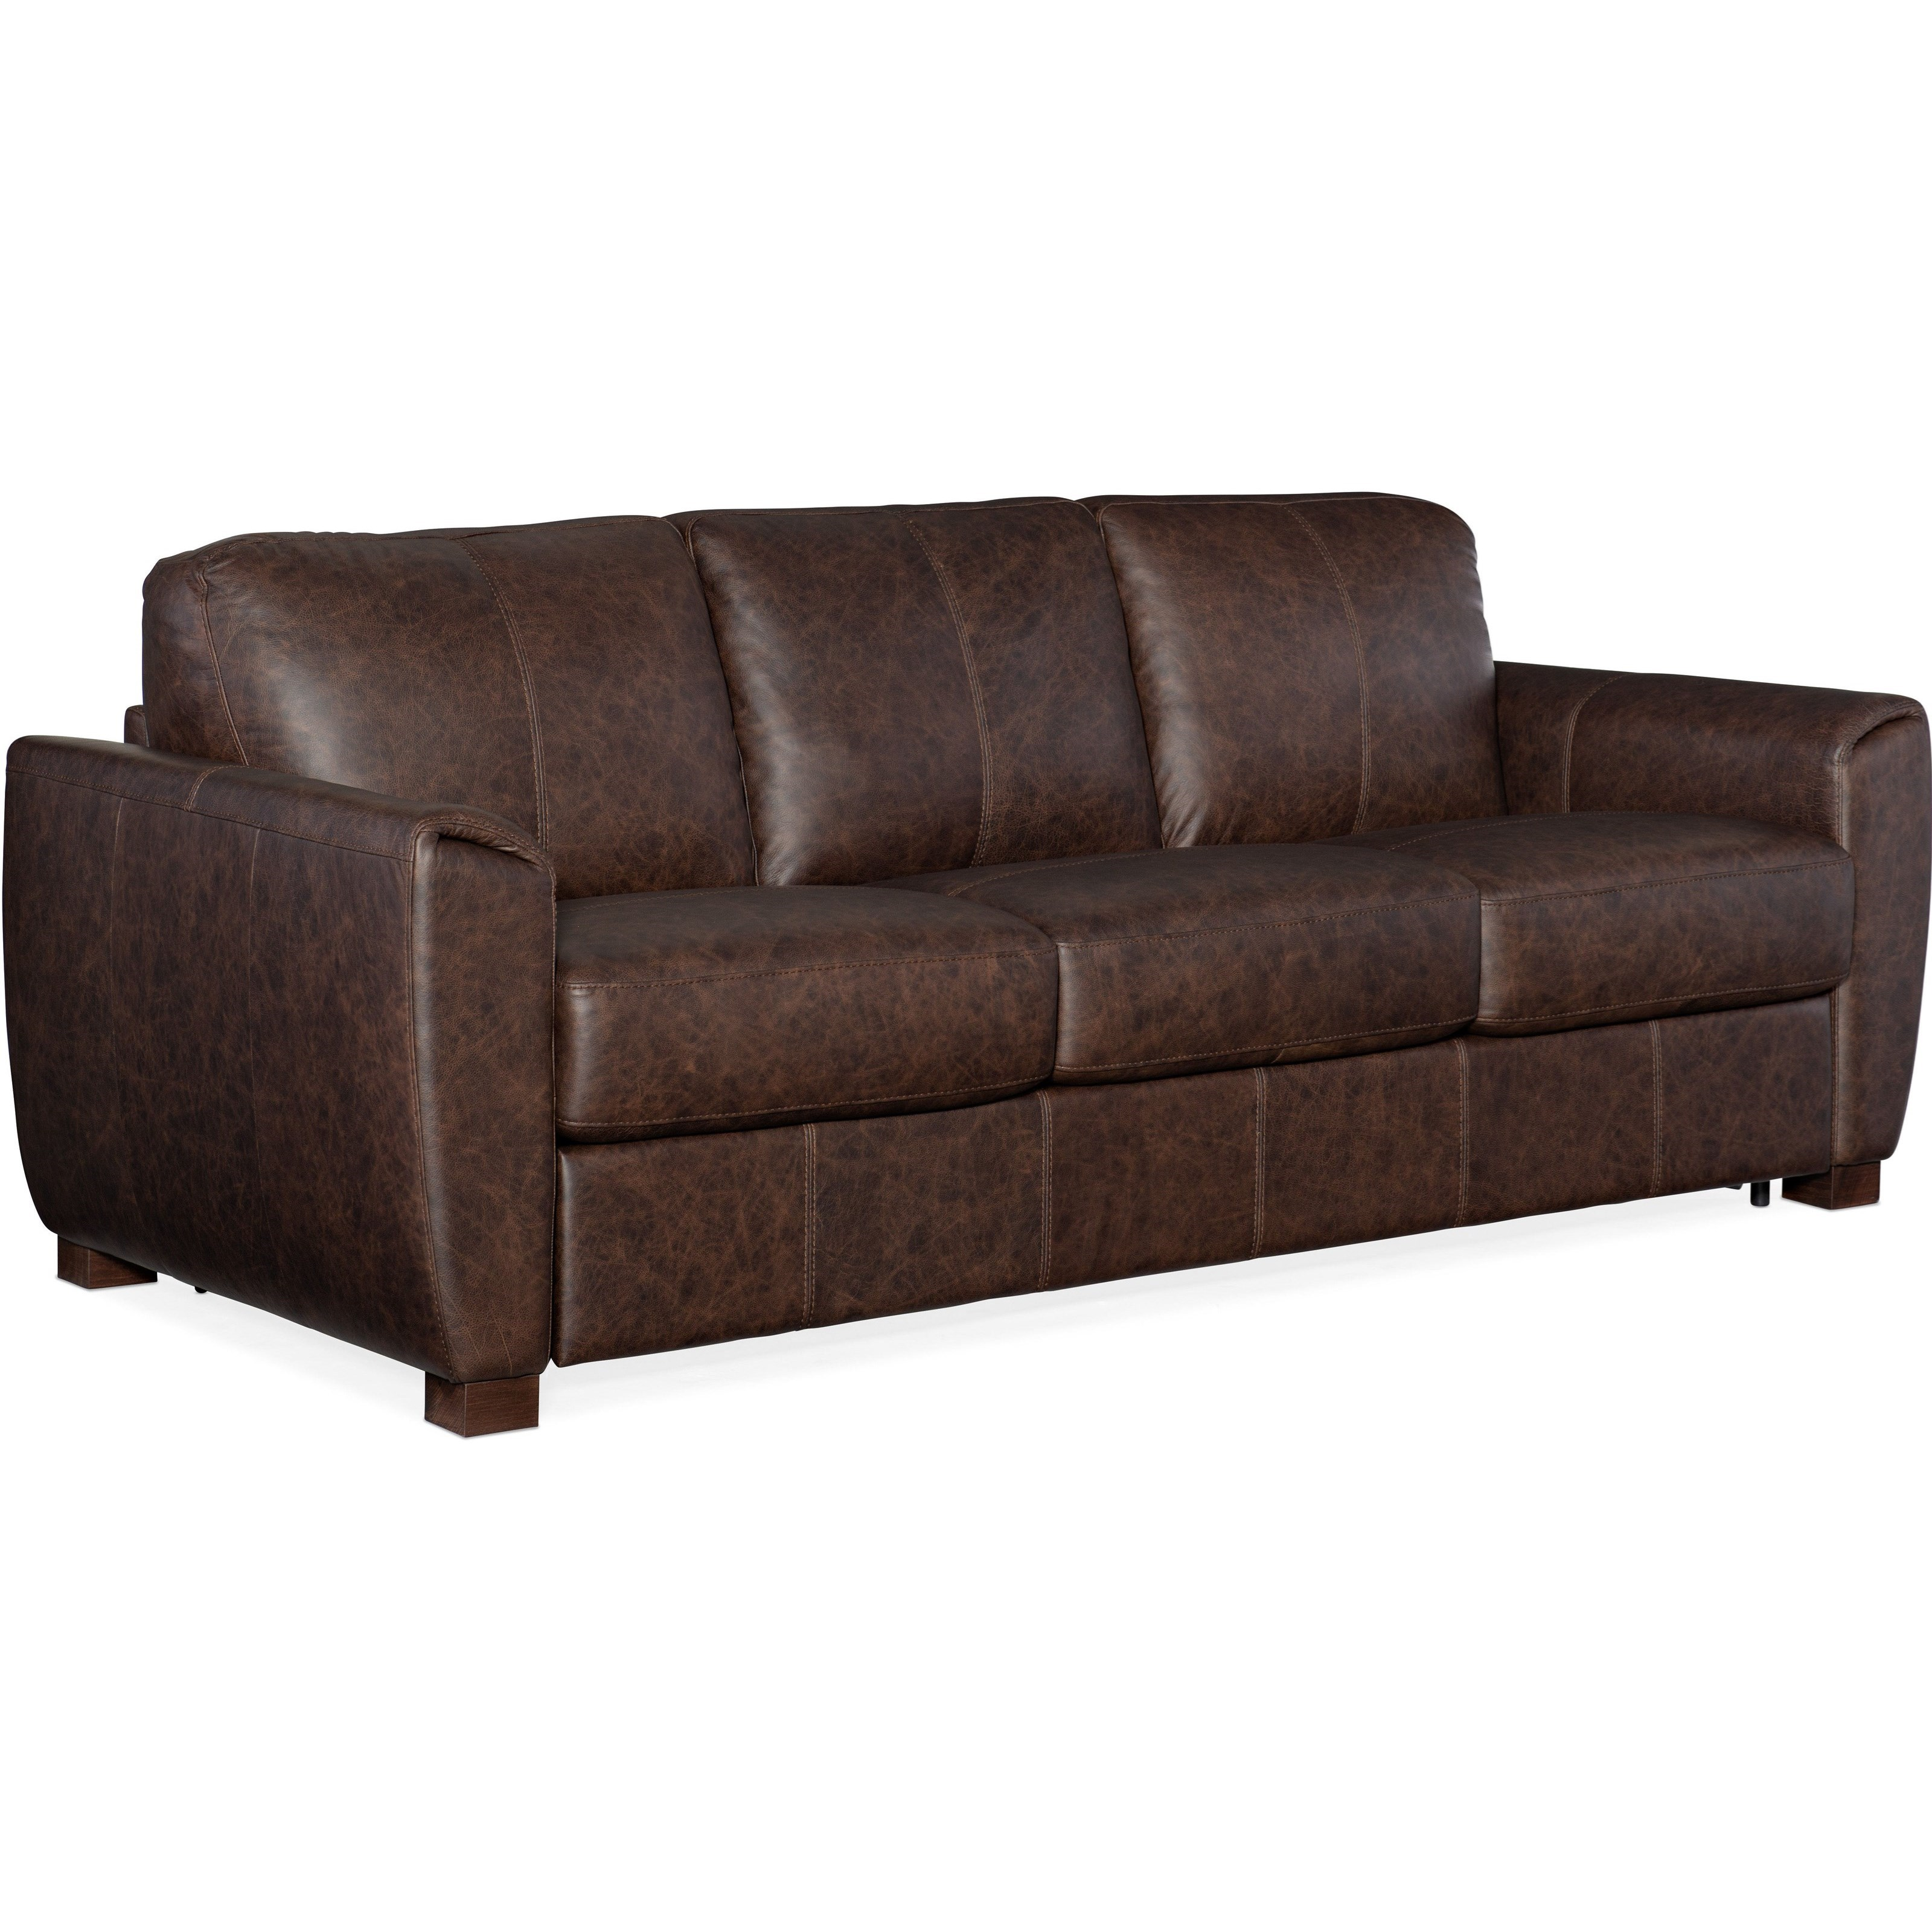 Strange Hooker Furniture Torrington Ss721 Sl3 089 Casual Leather Theyellowbook Wood Chair Design Ideas Theyellowbookinfo